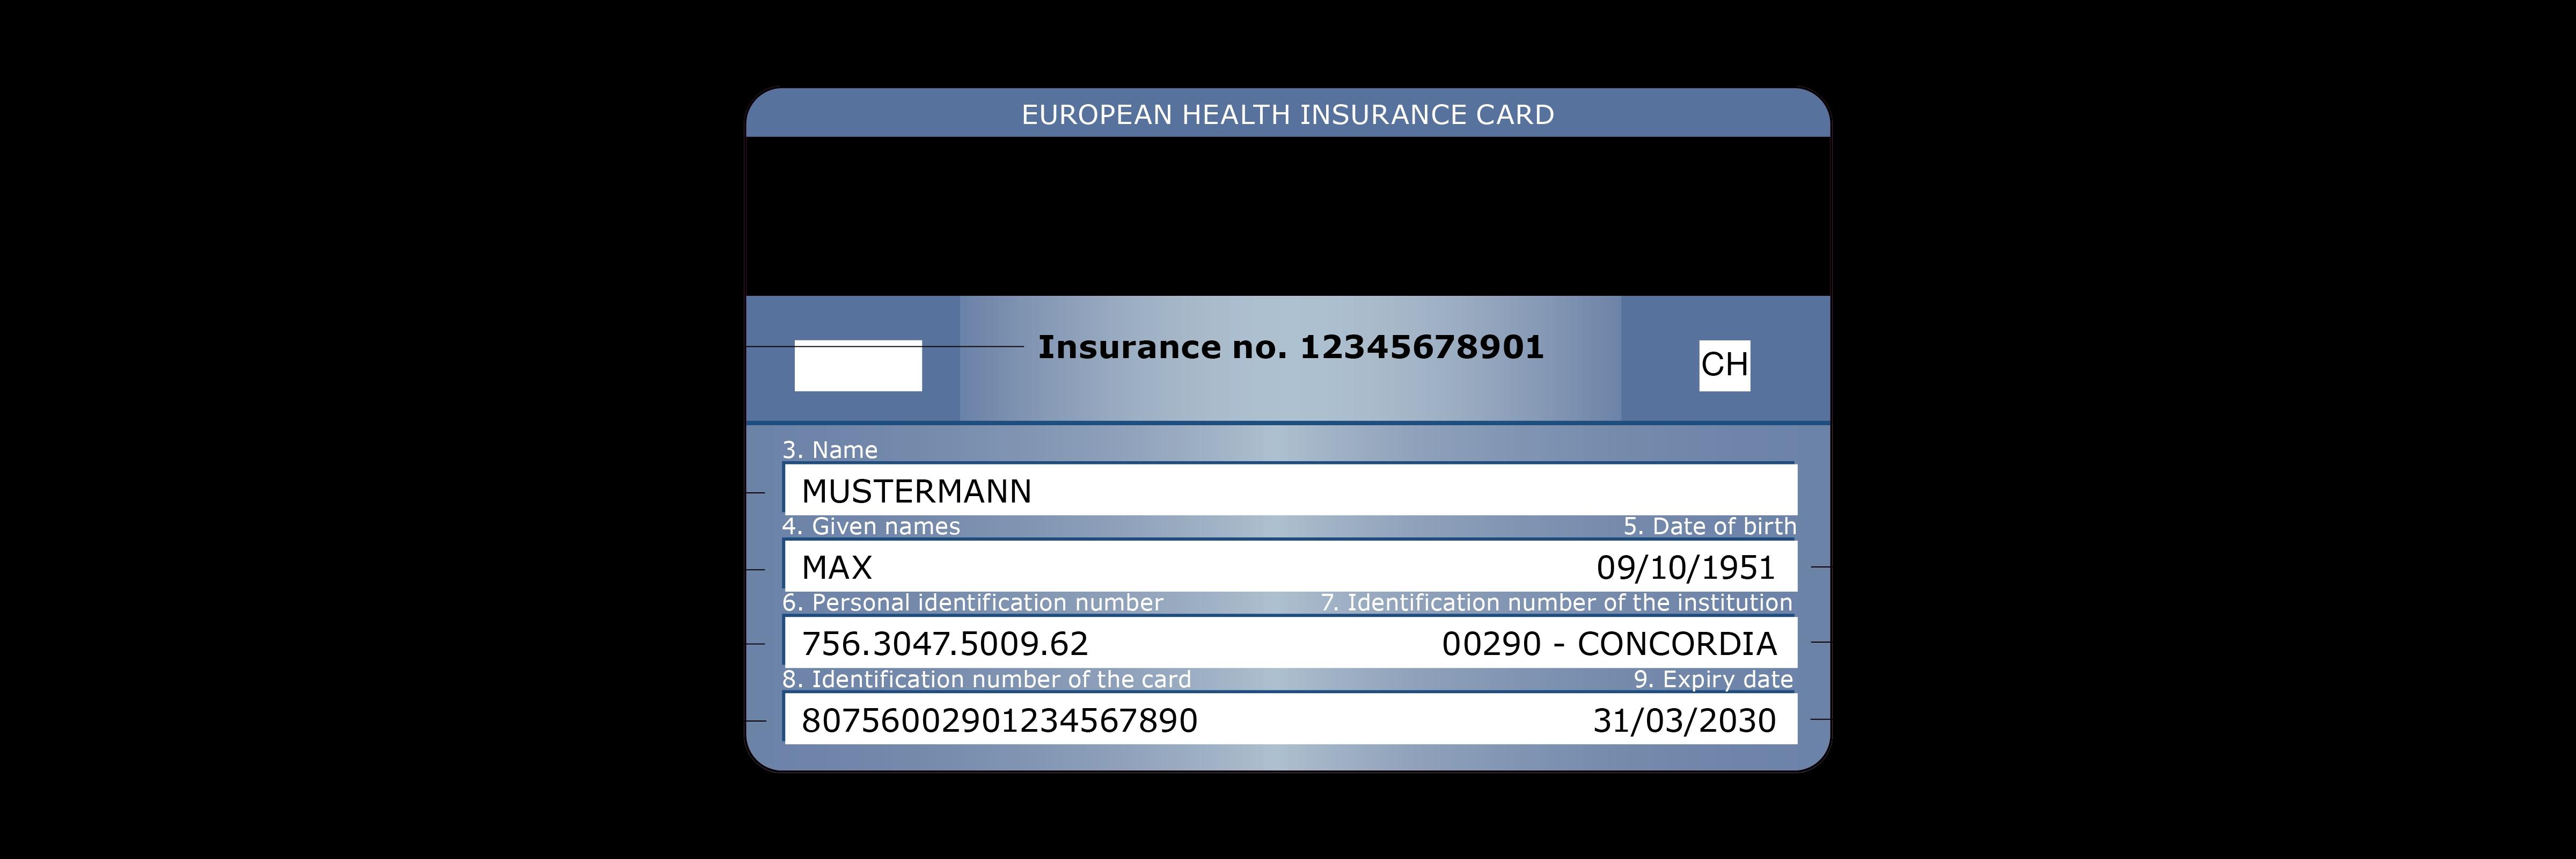 Carte Assurance Maladie Naissance.Concordia Carte Europeenne D Assurance Maladie Au Verso